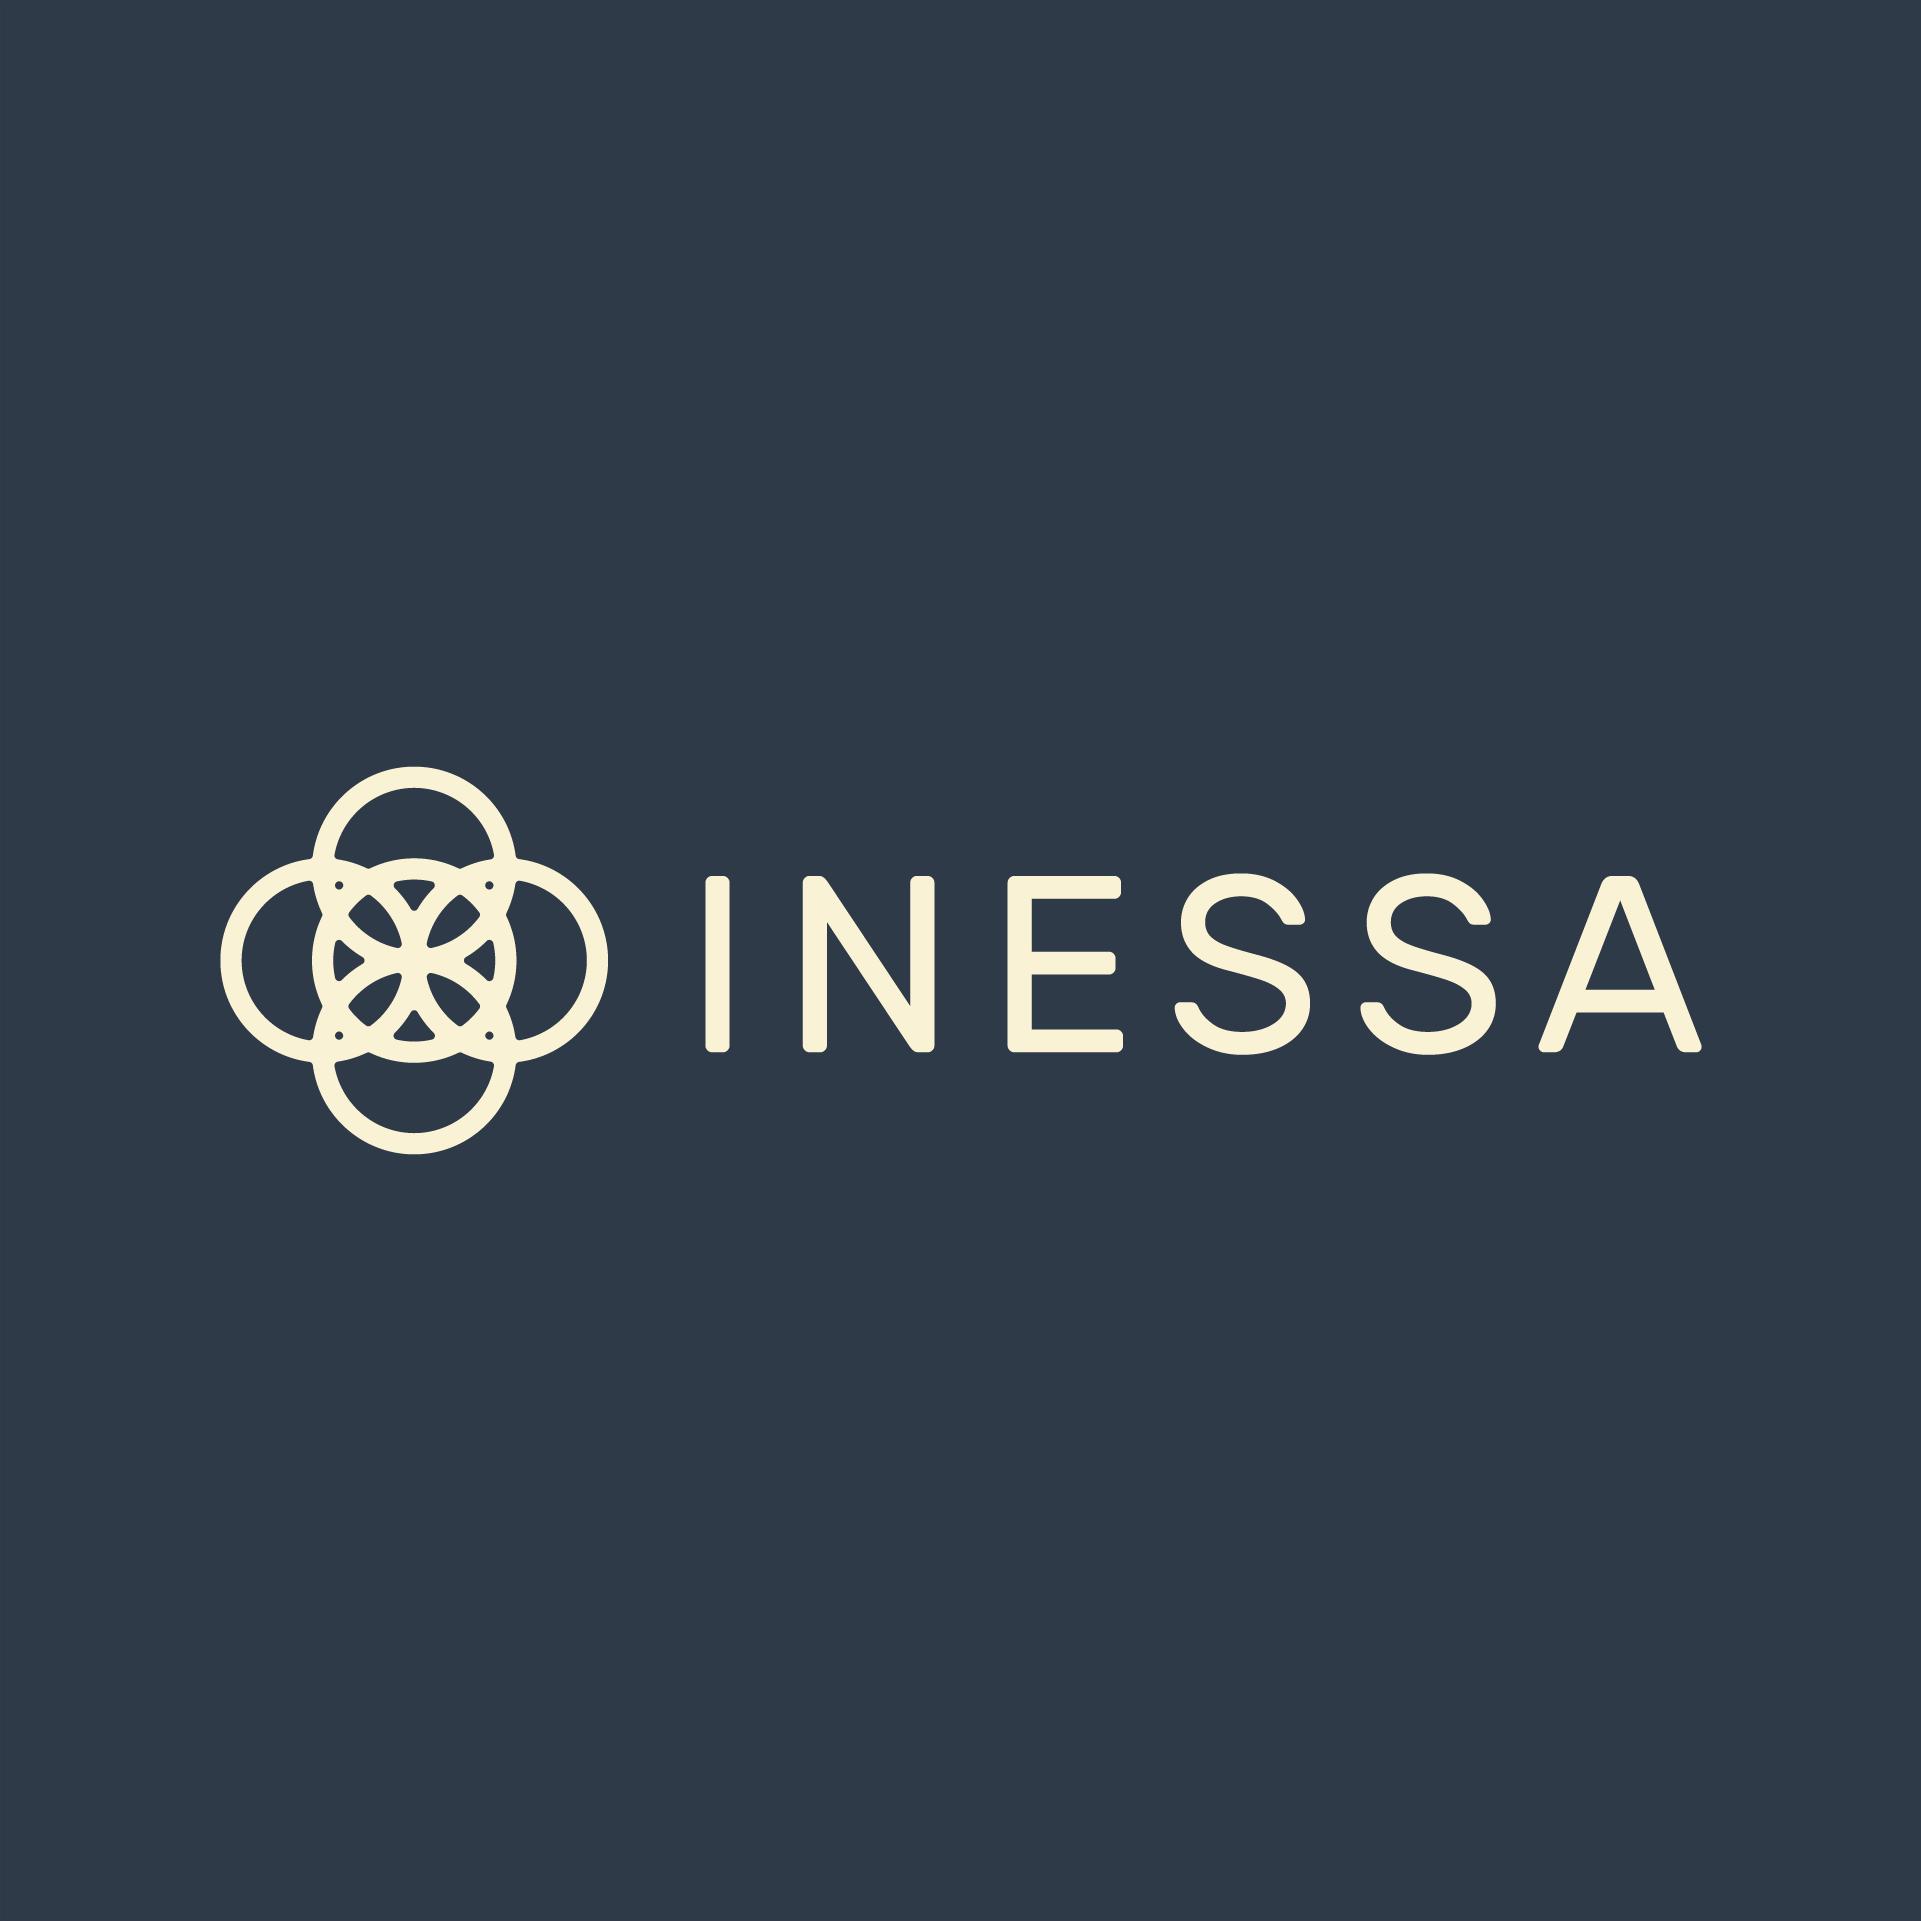 Inessa-Logo_Horizontal reversed copy.png